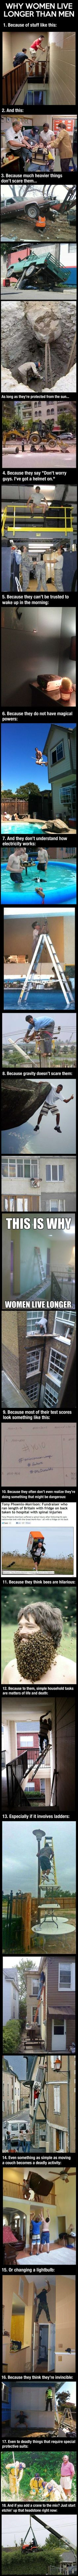 Why woman live longer